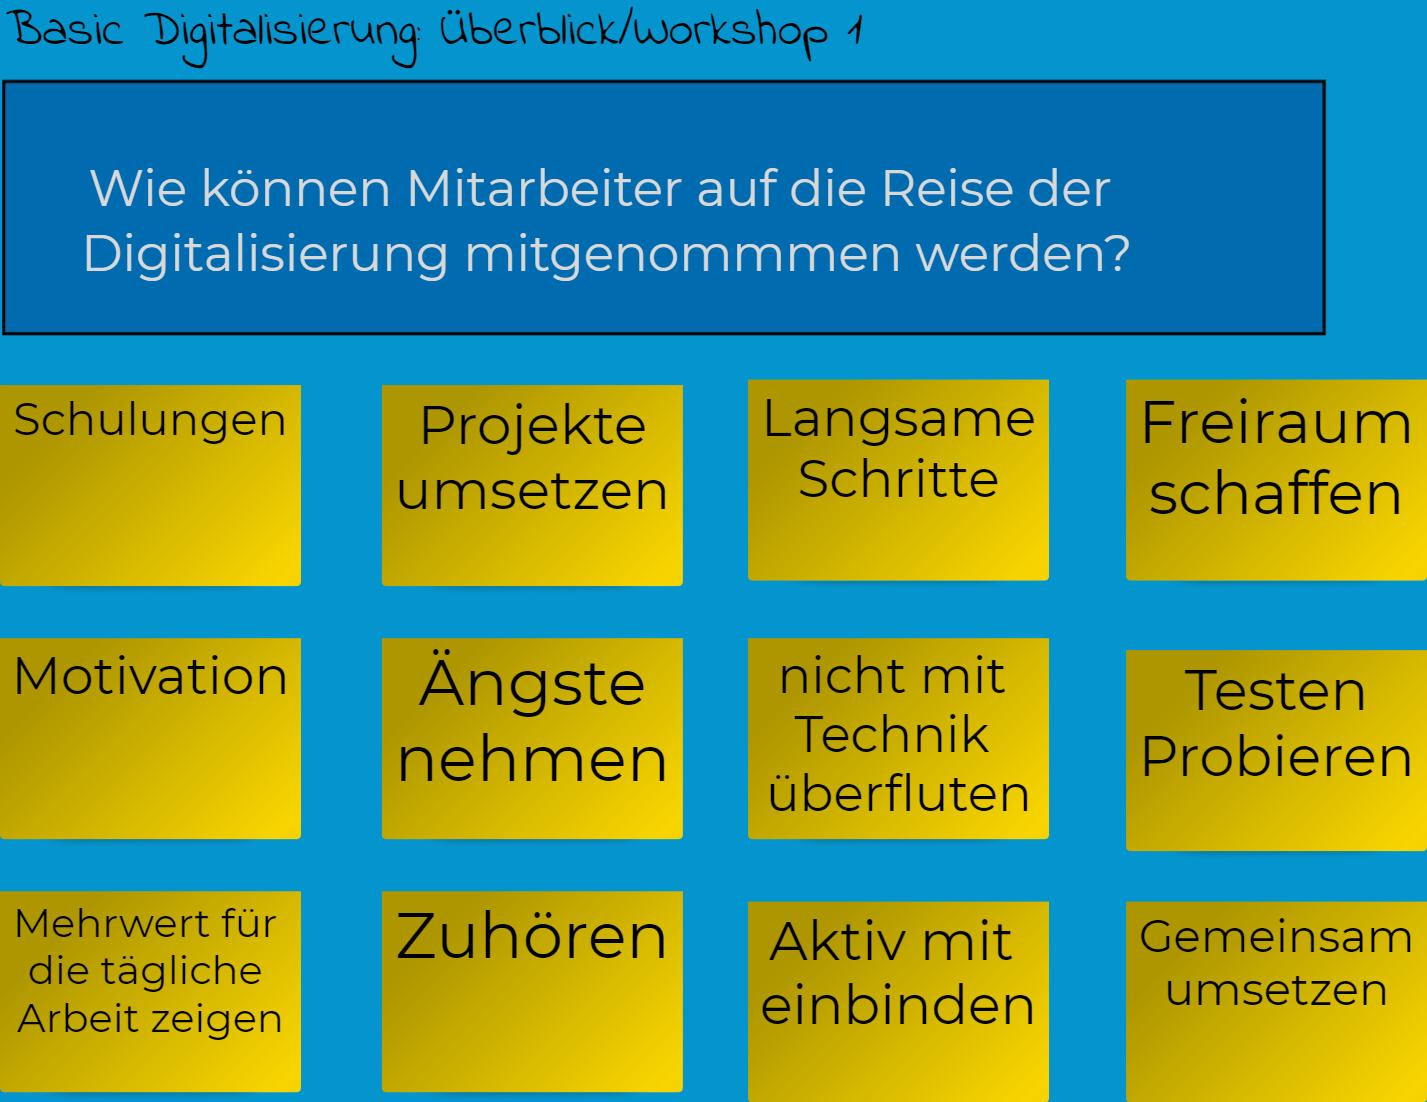 Gruppenboard - Digitalisierung GANZ KONKRET (2)